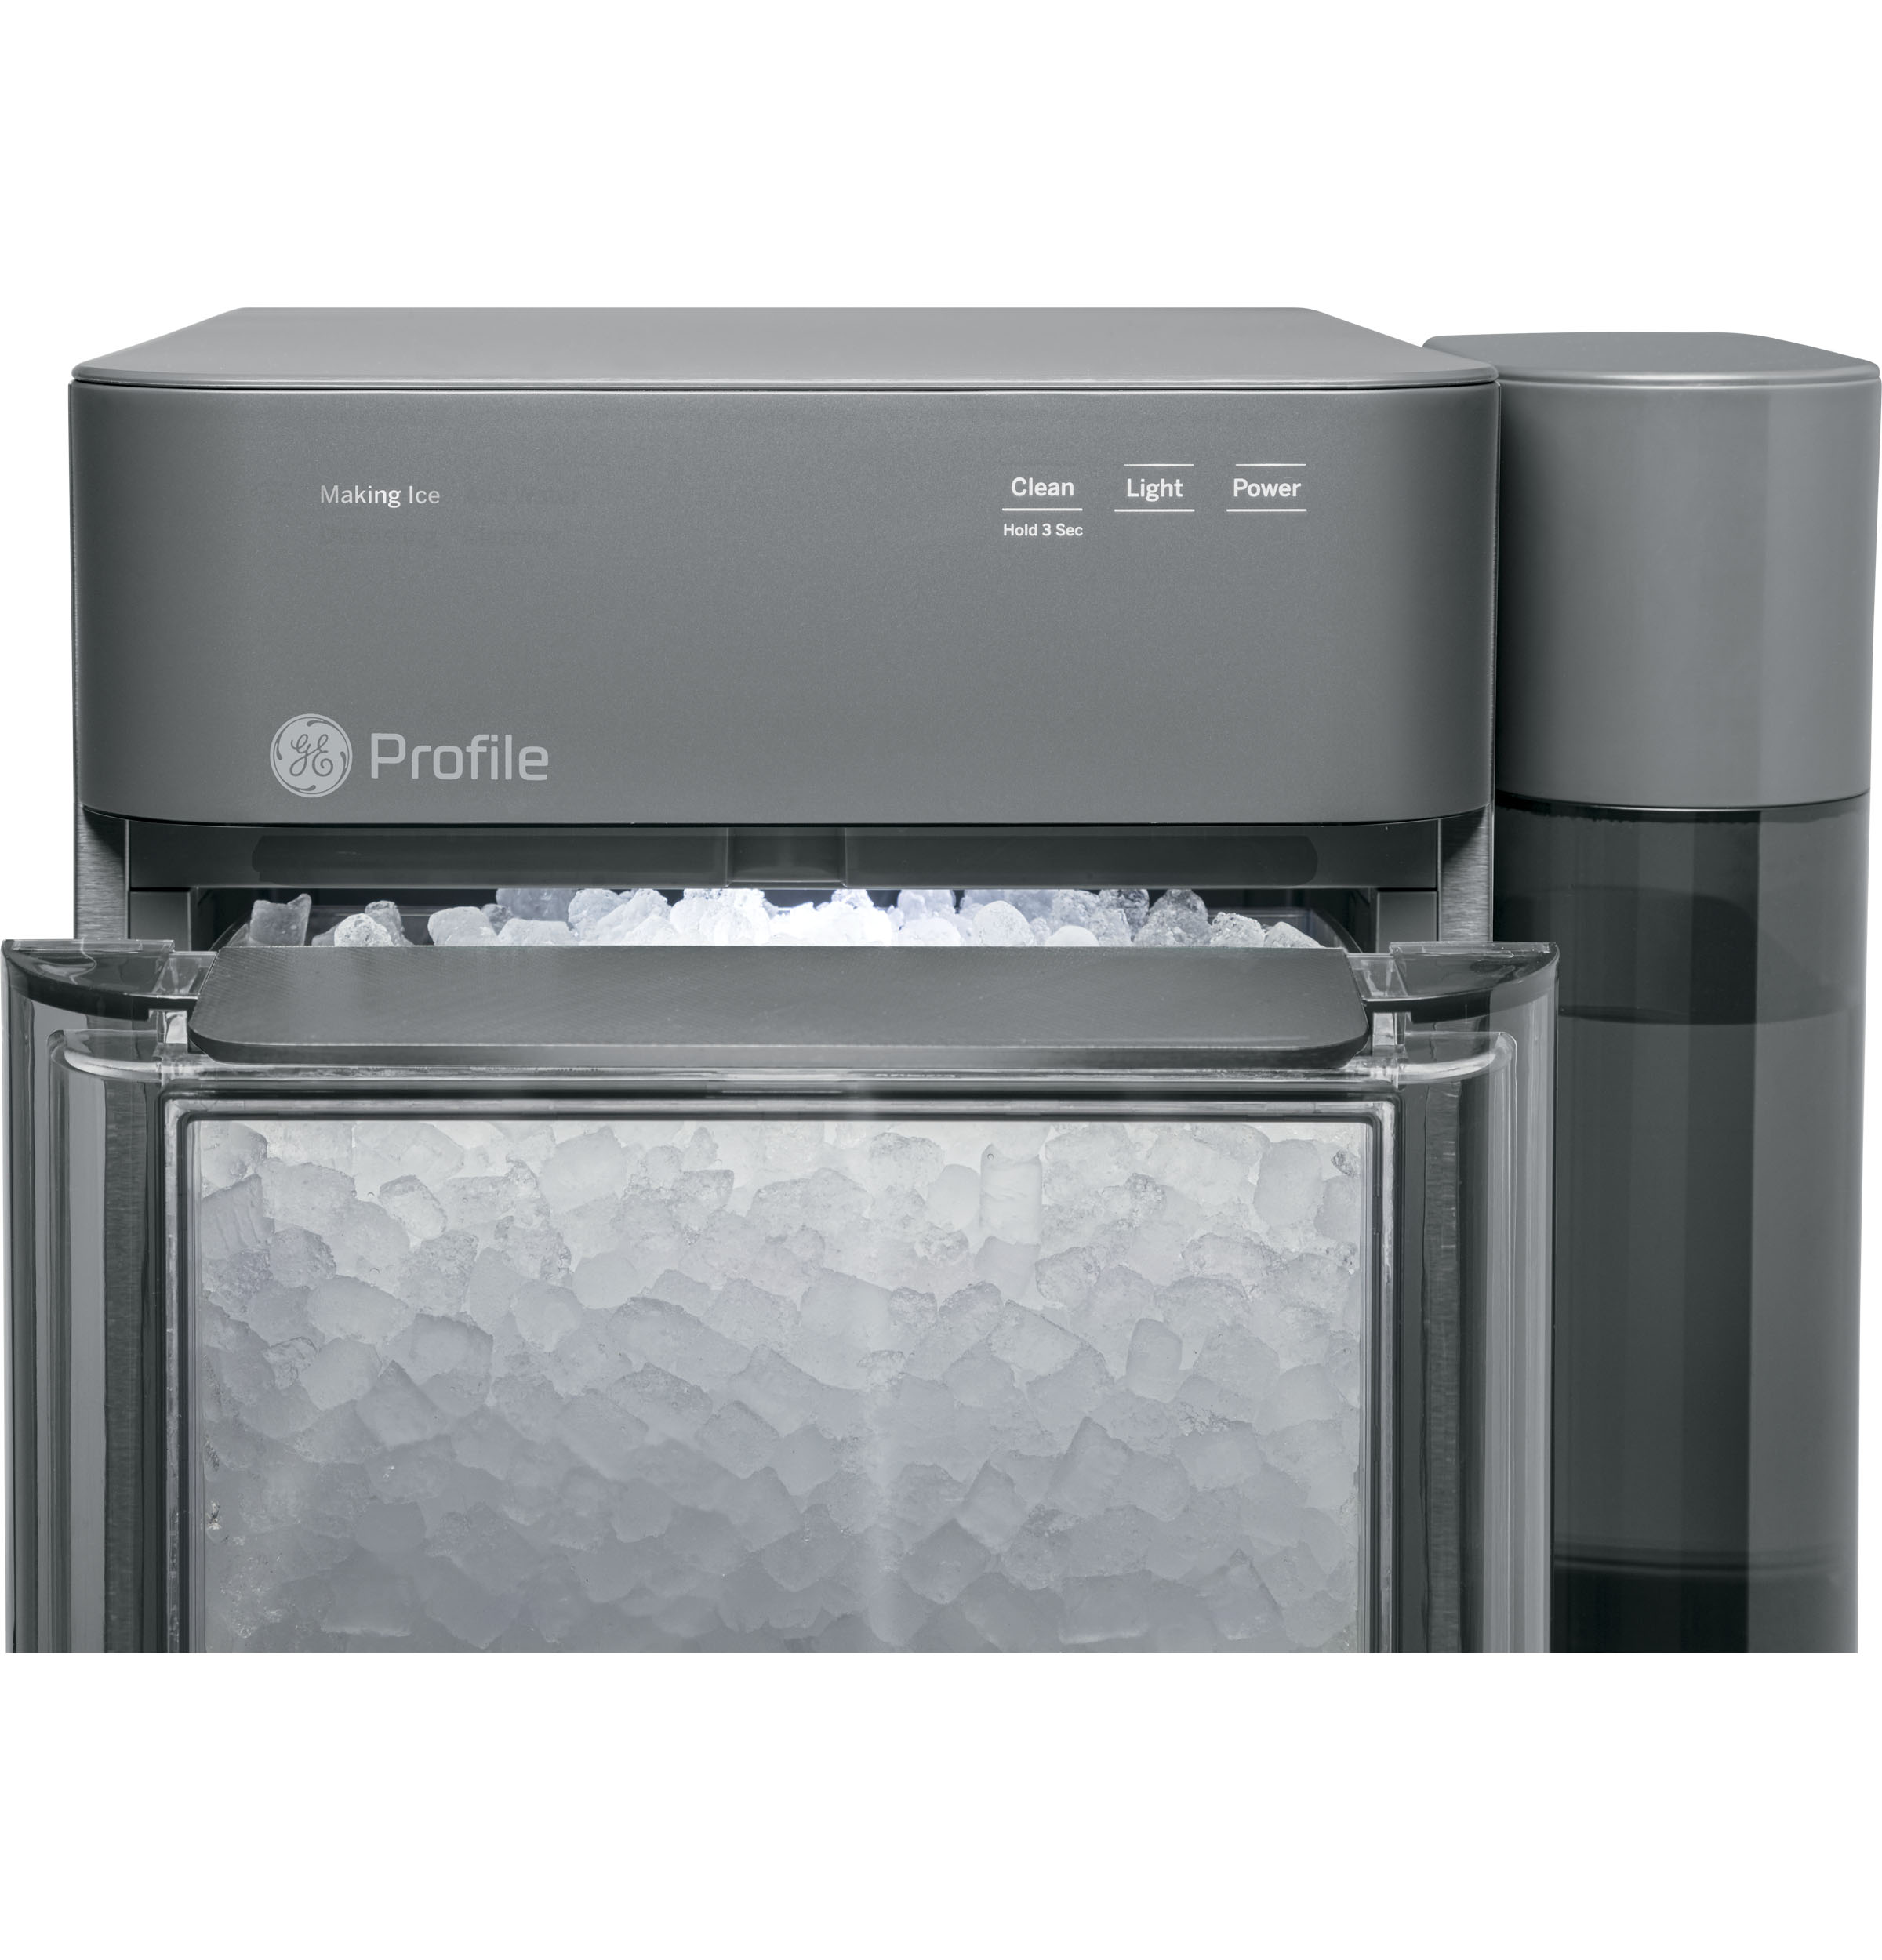 Model: XPIO13SCSS | GE Profile GE Profile™ Opal 2.0 Nugget Ice Maker